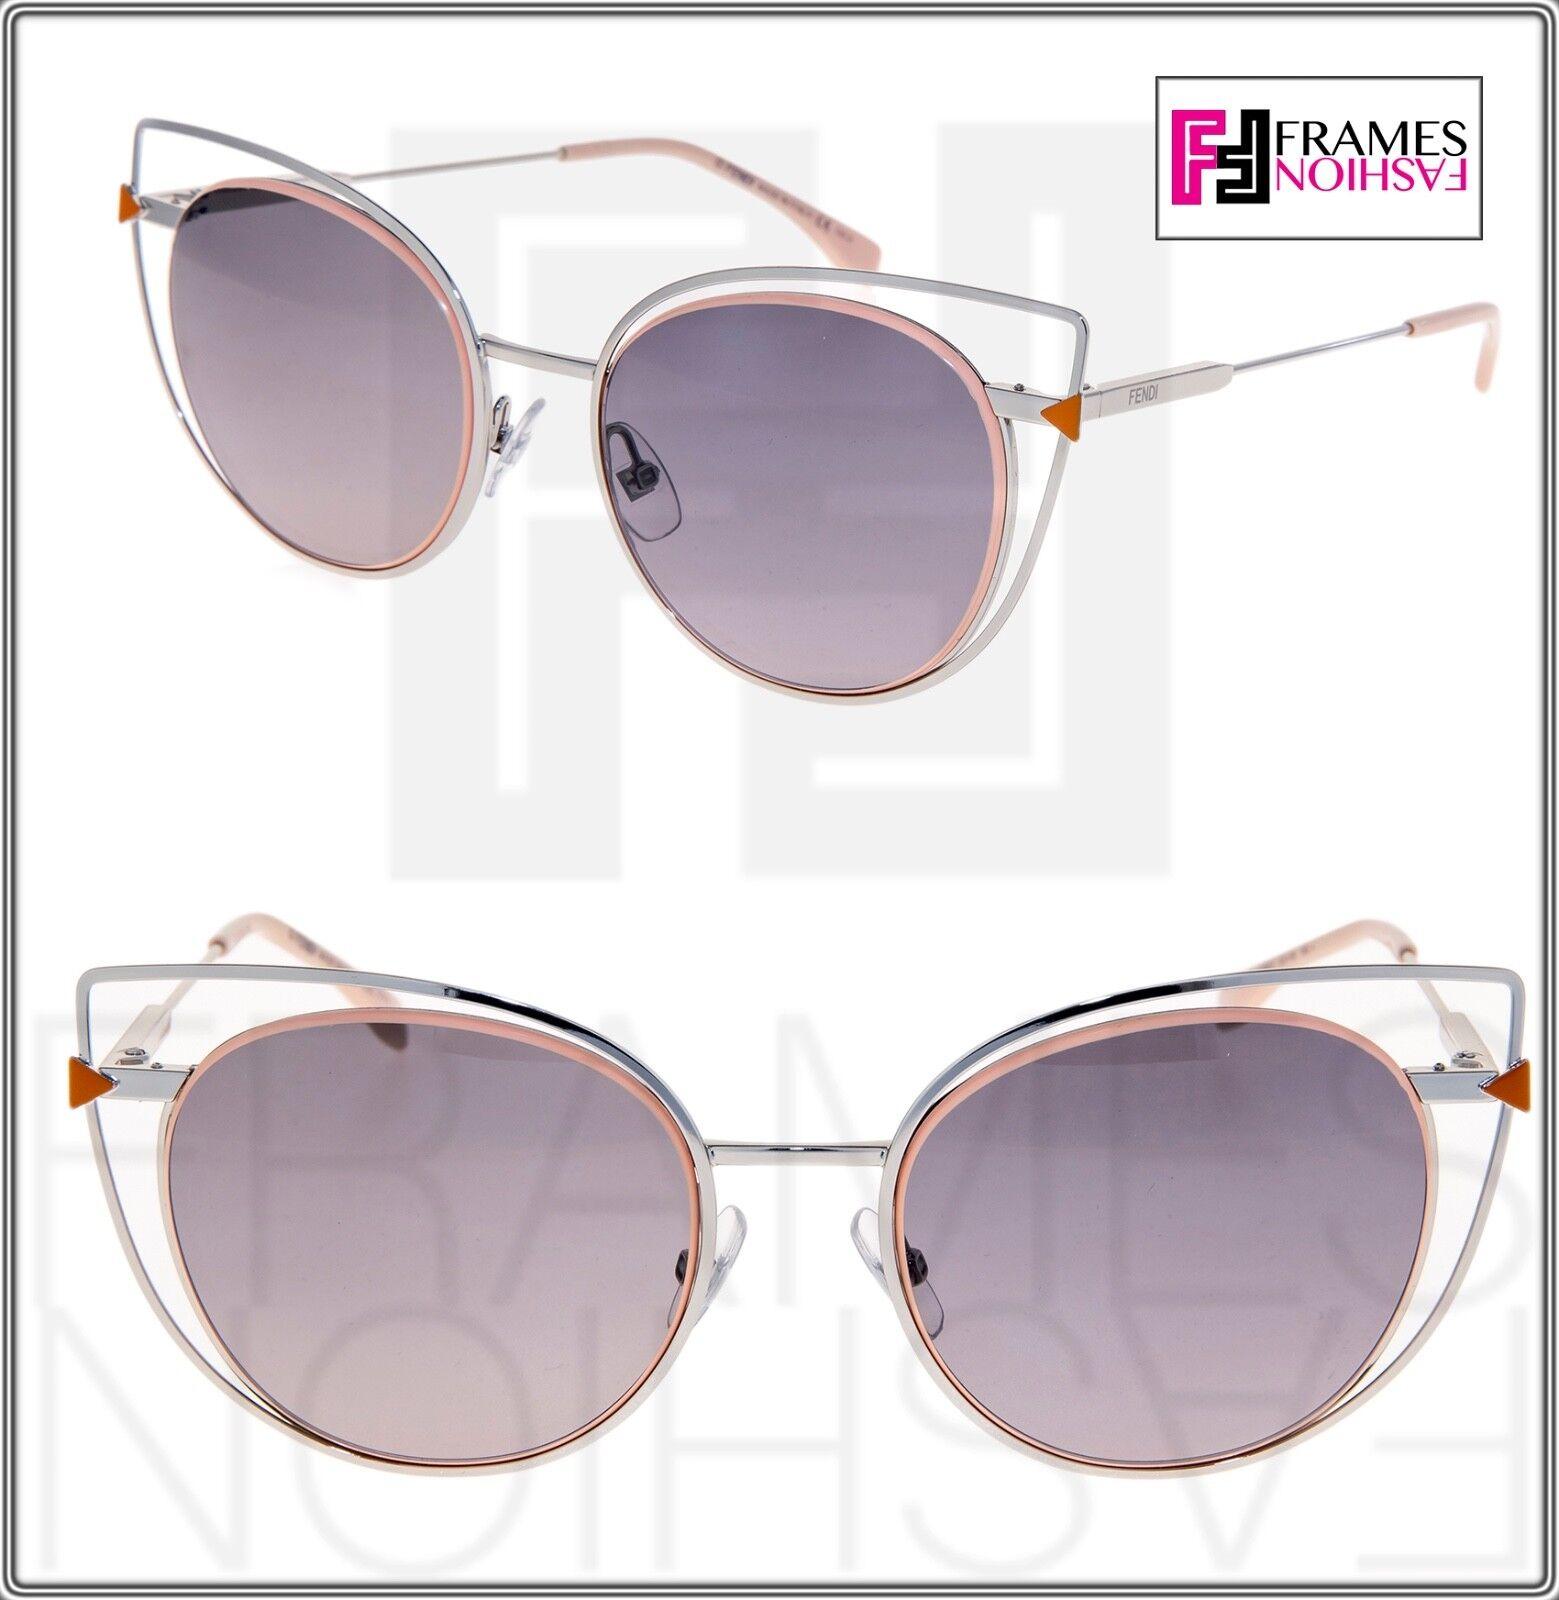 FENDI FF0176S Palladium Pink Cat Eye Sunglasses Metal Triangle 0176 Women